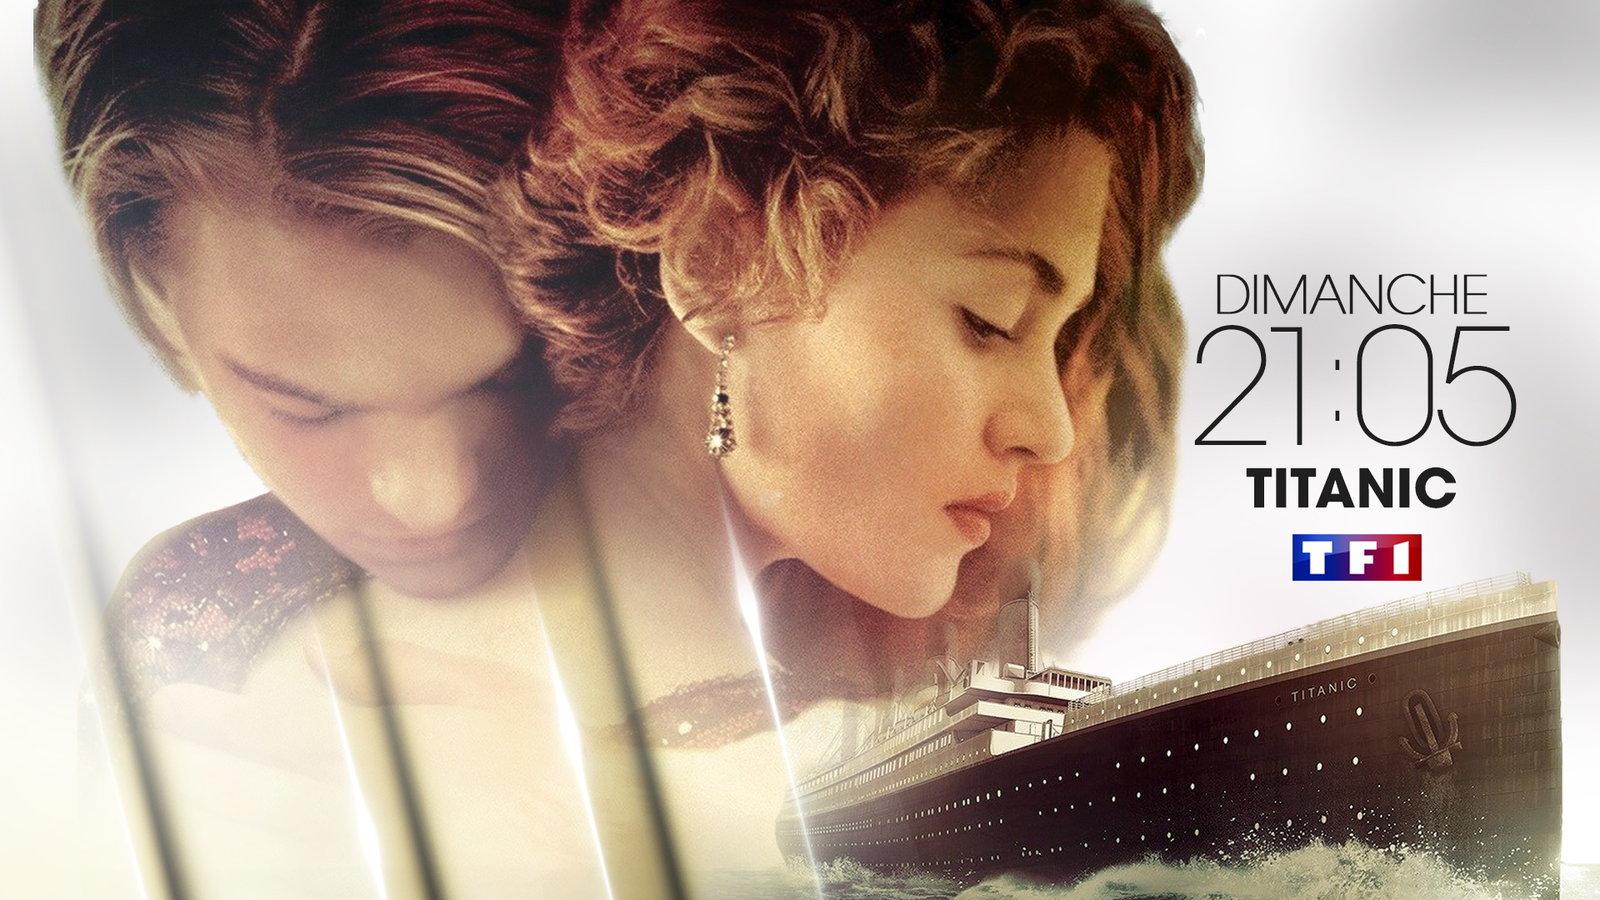 Titanic IMAGE